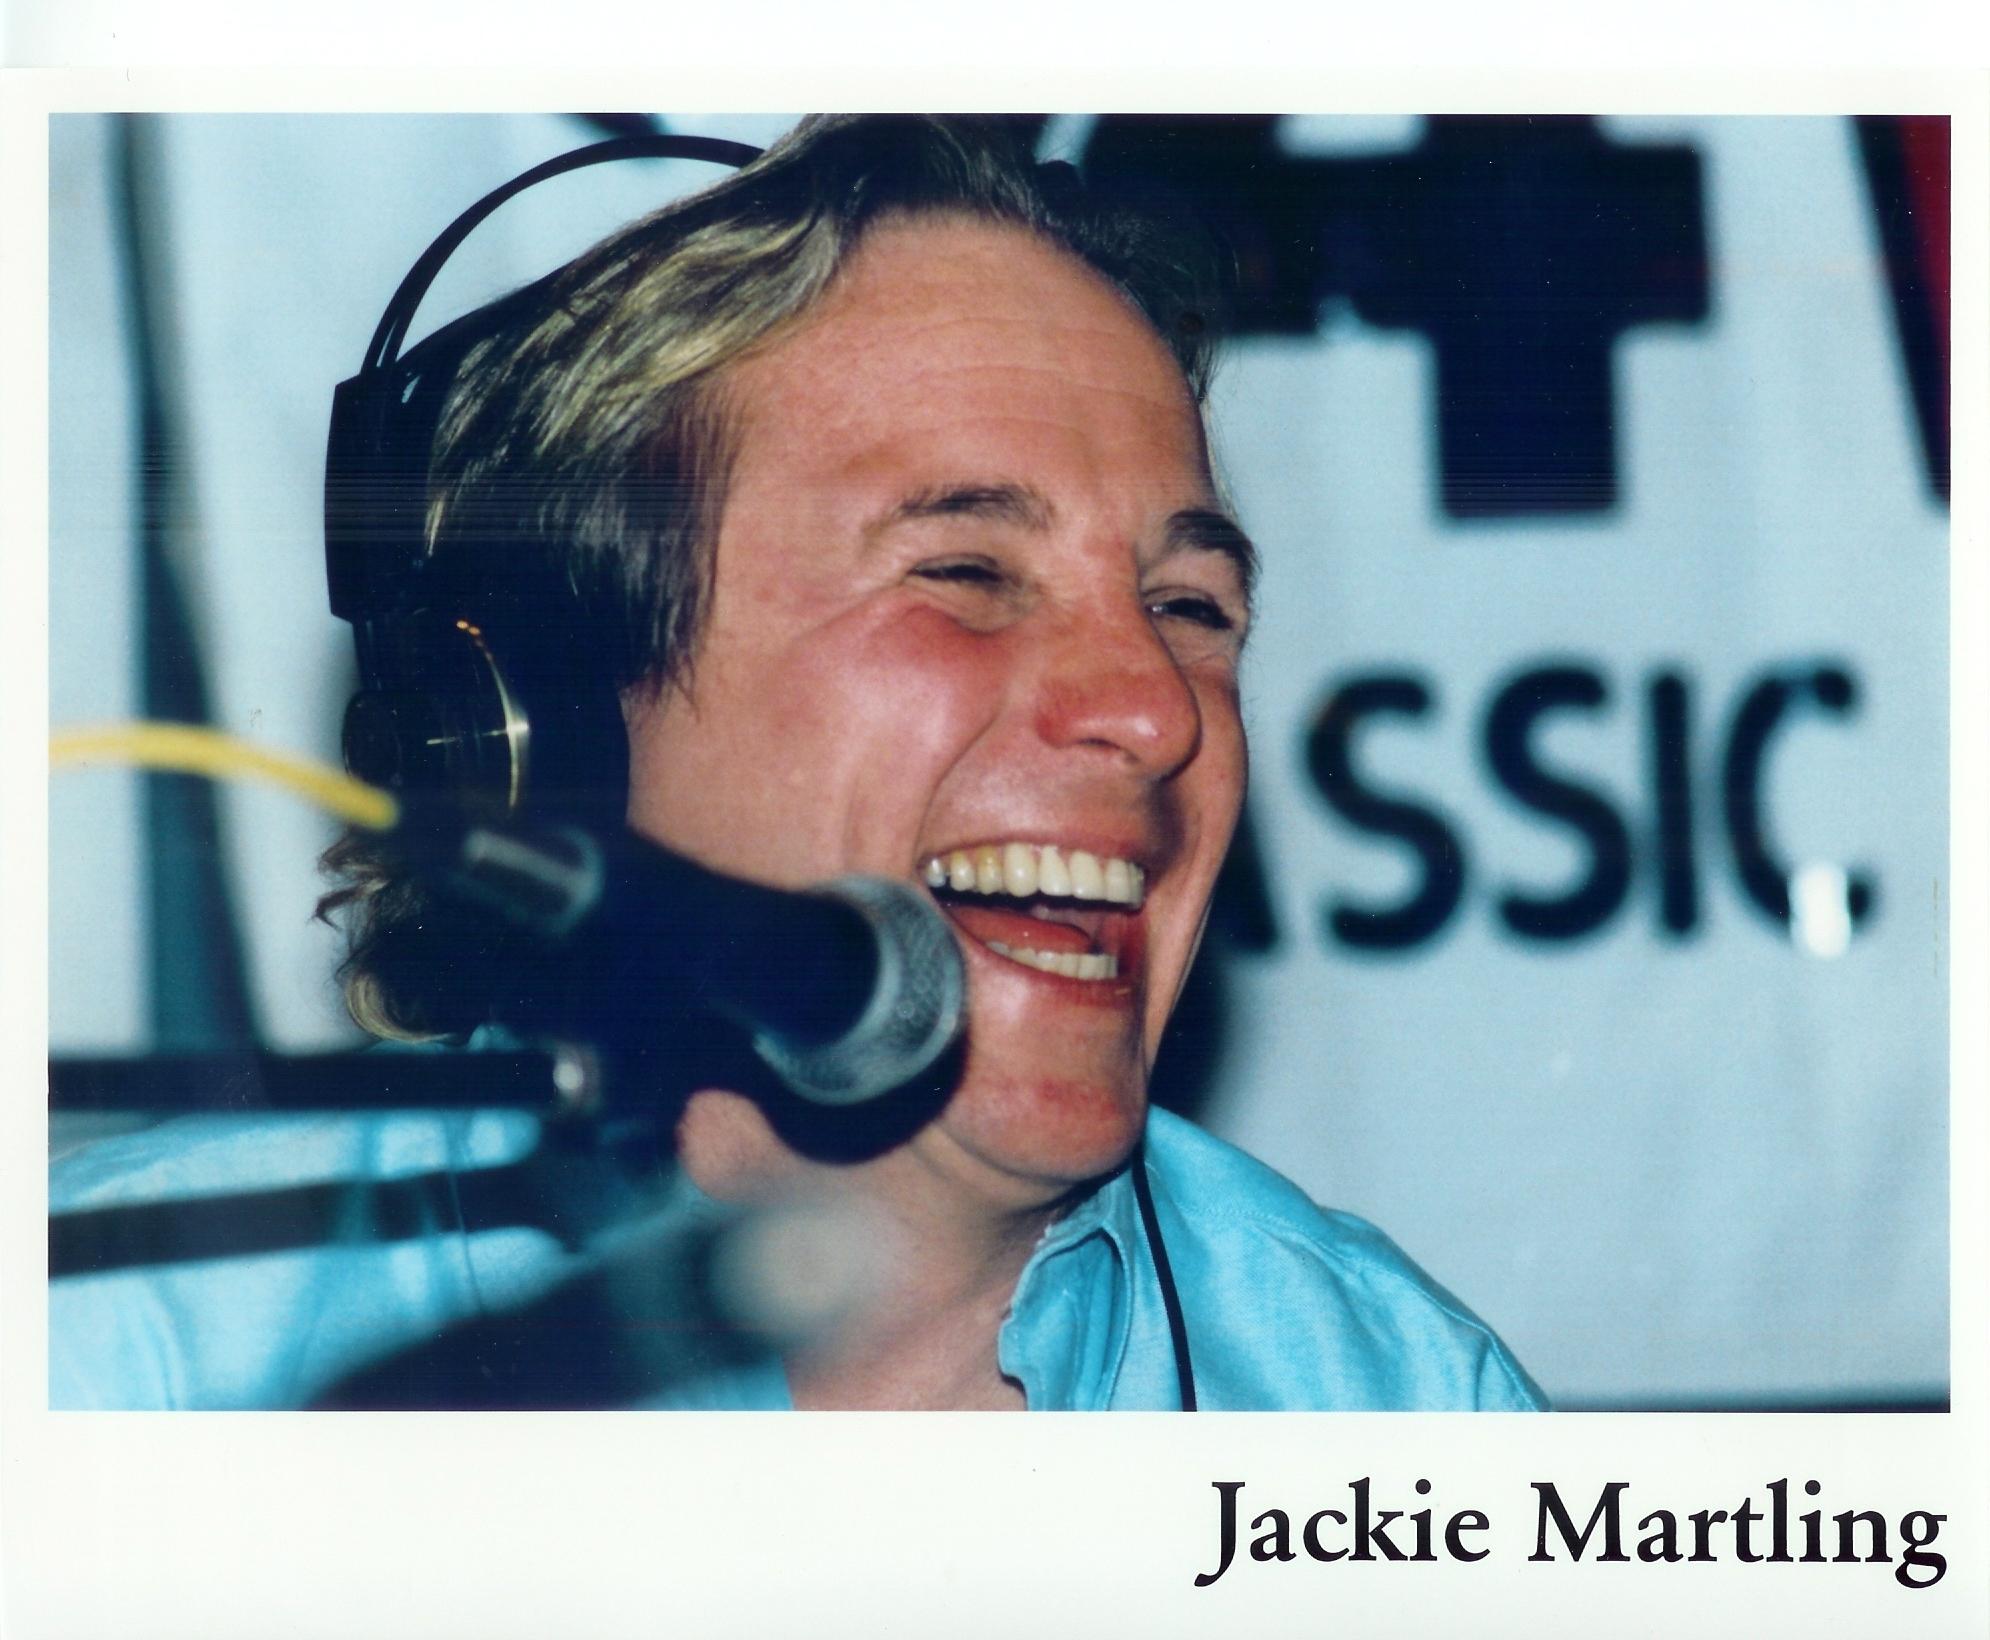 Jackie Martling